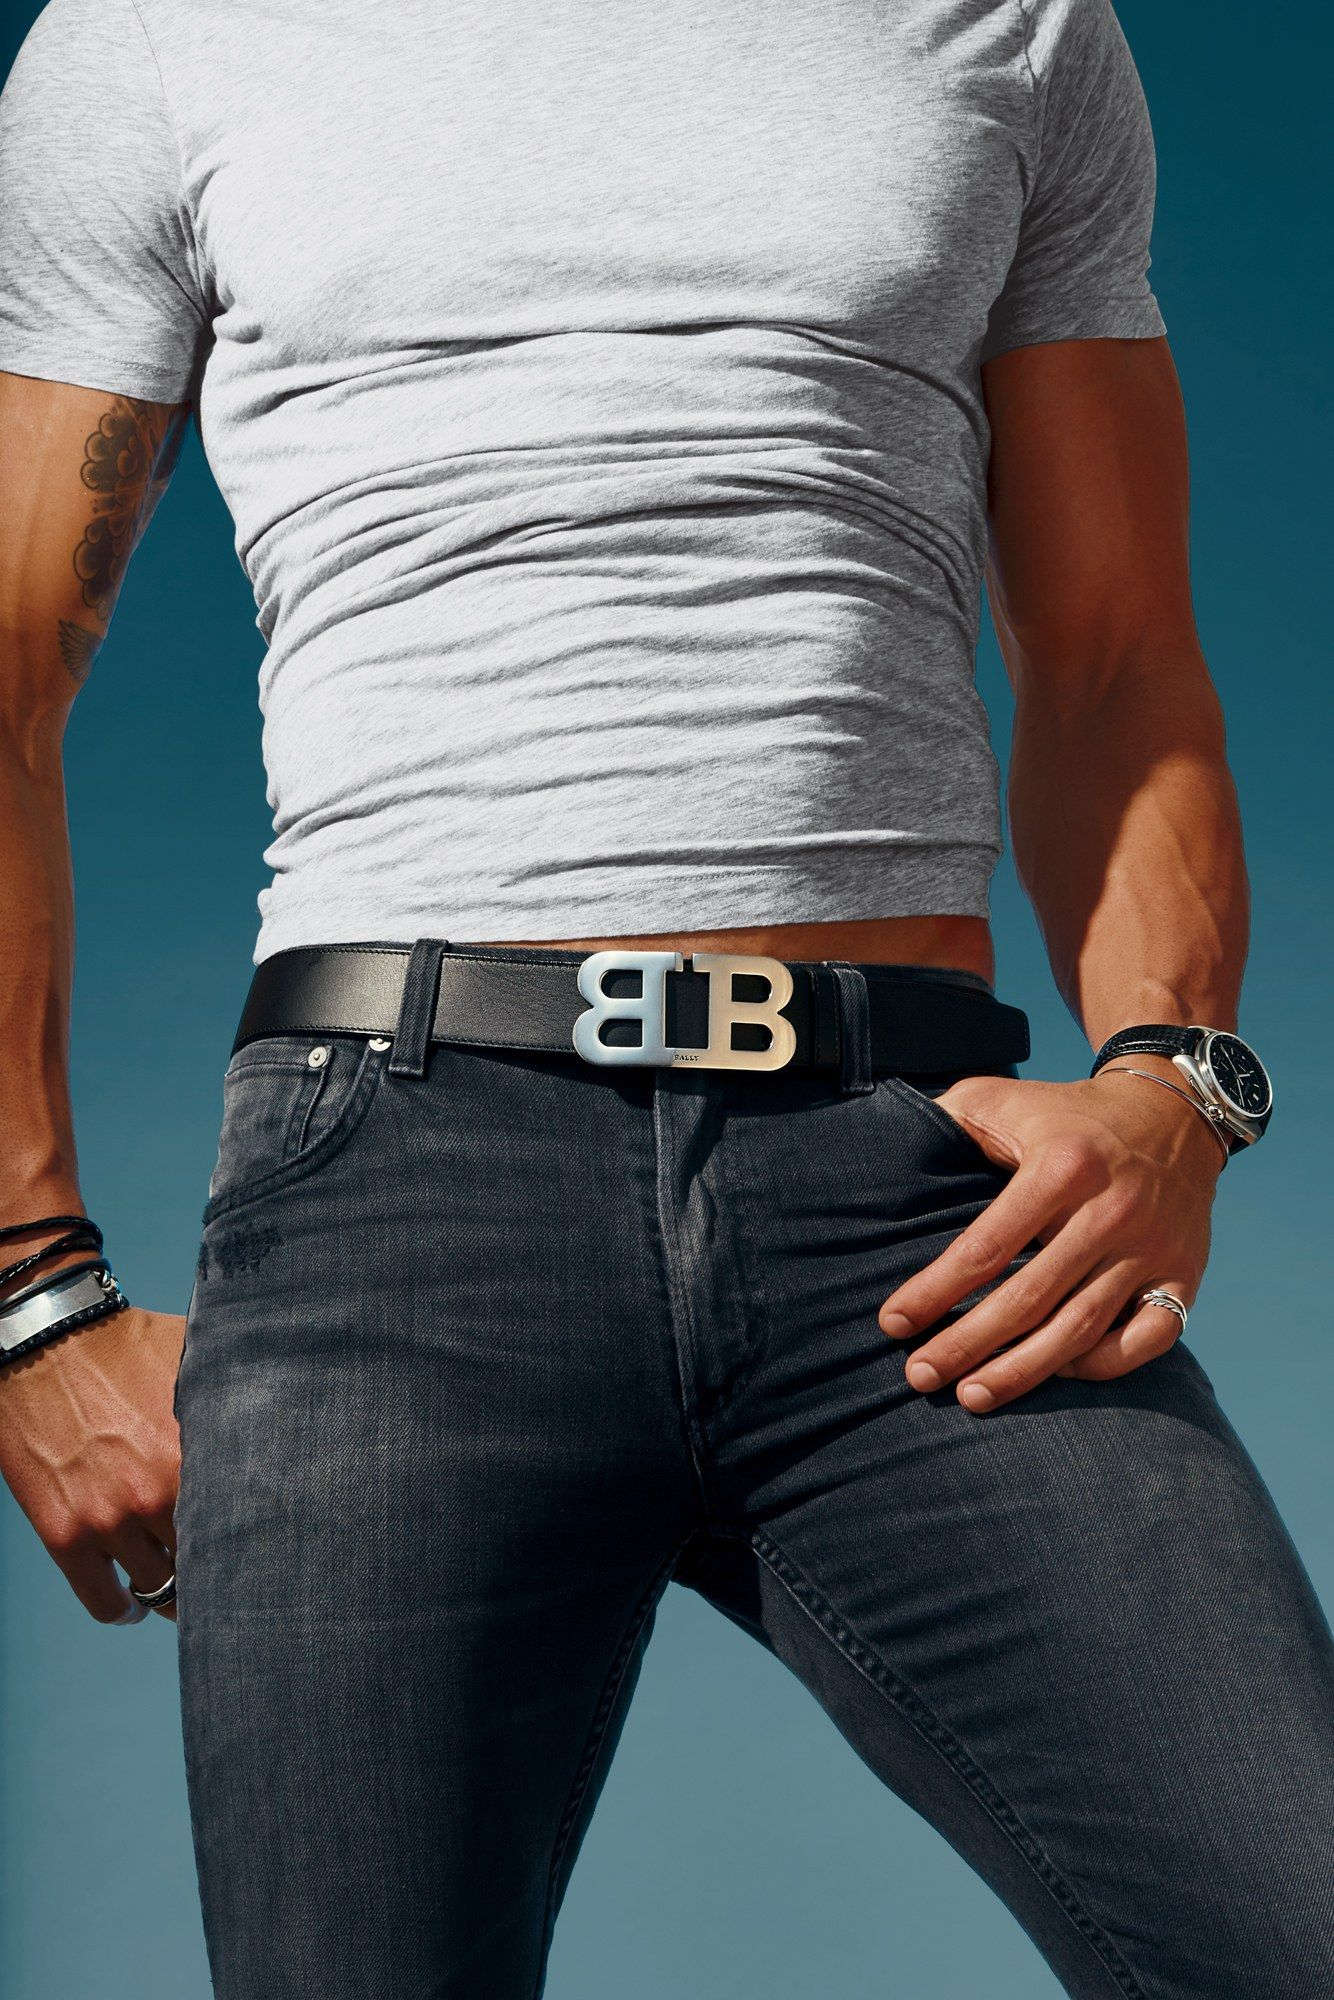 The 7 Biggest, Baddest, Boldest Belts of the Season